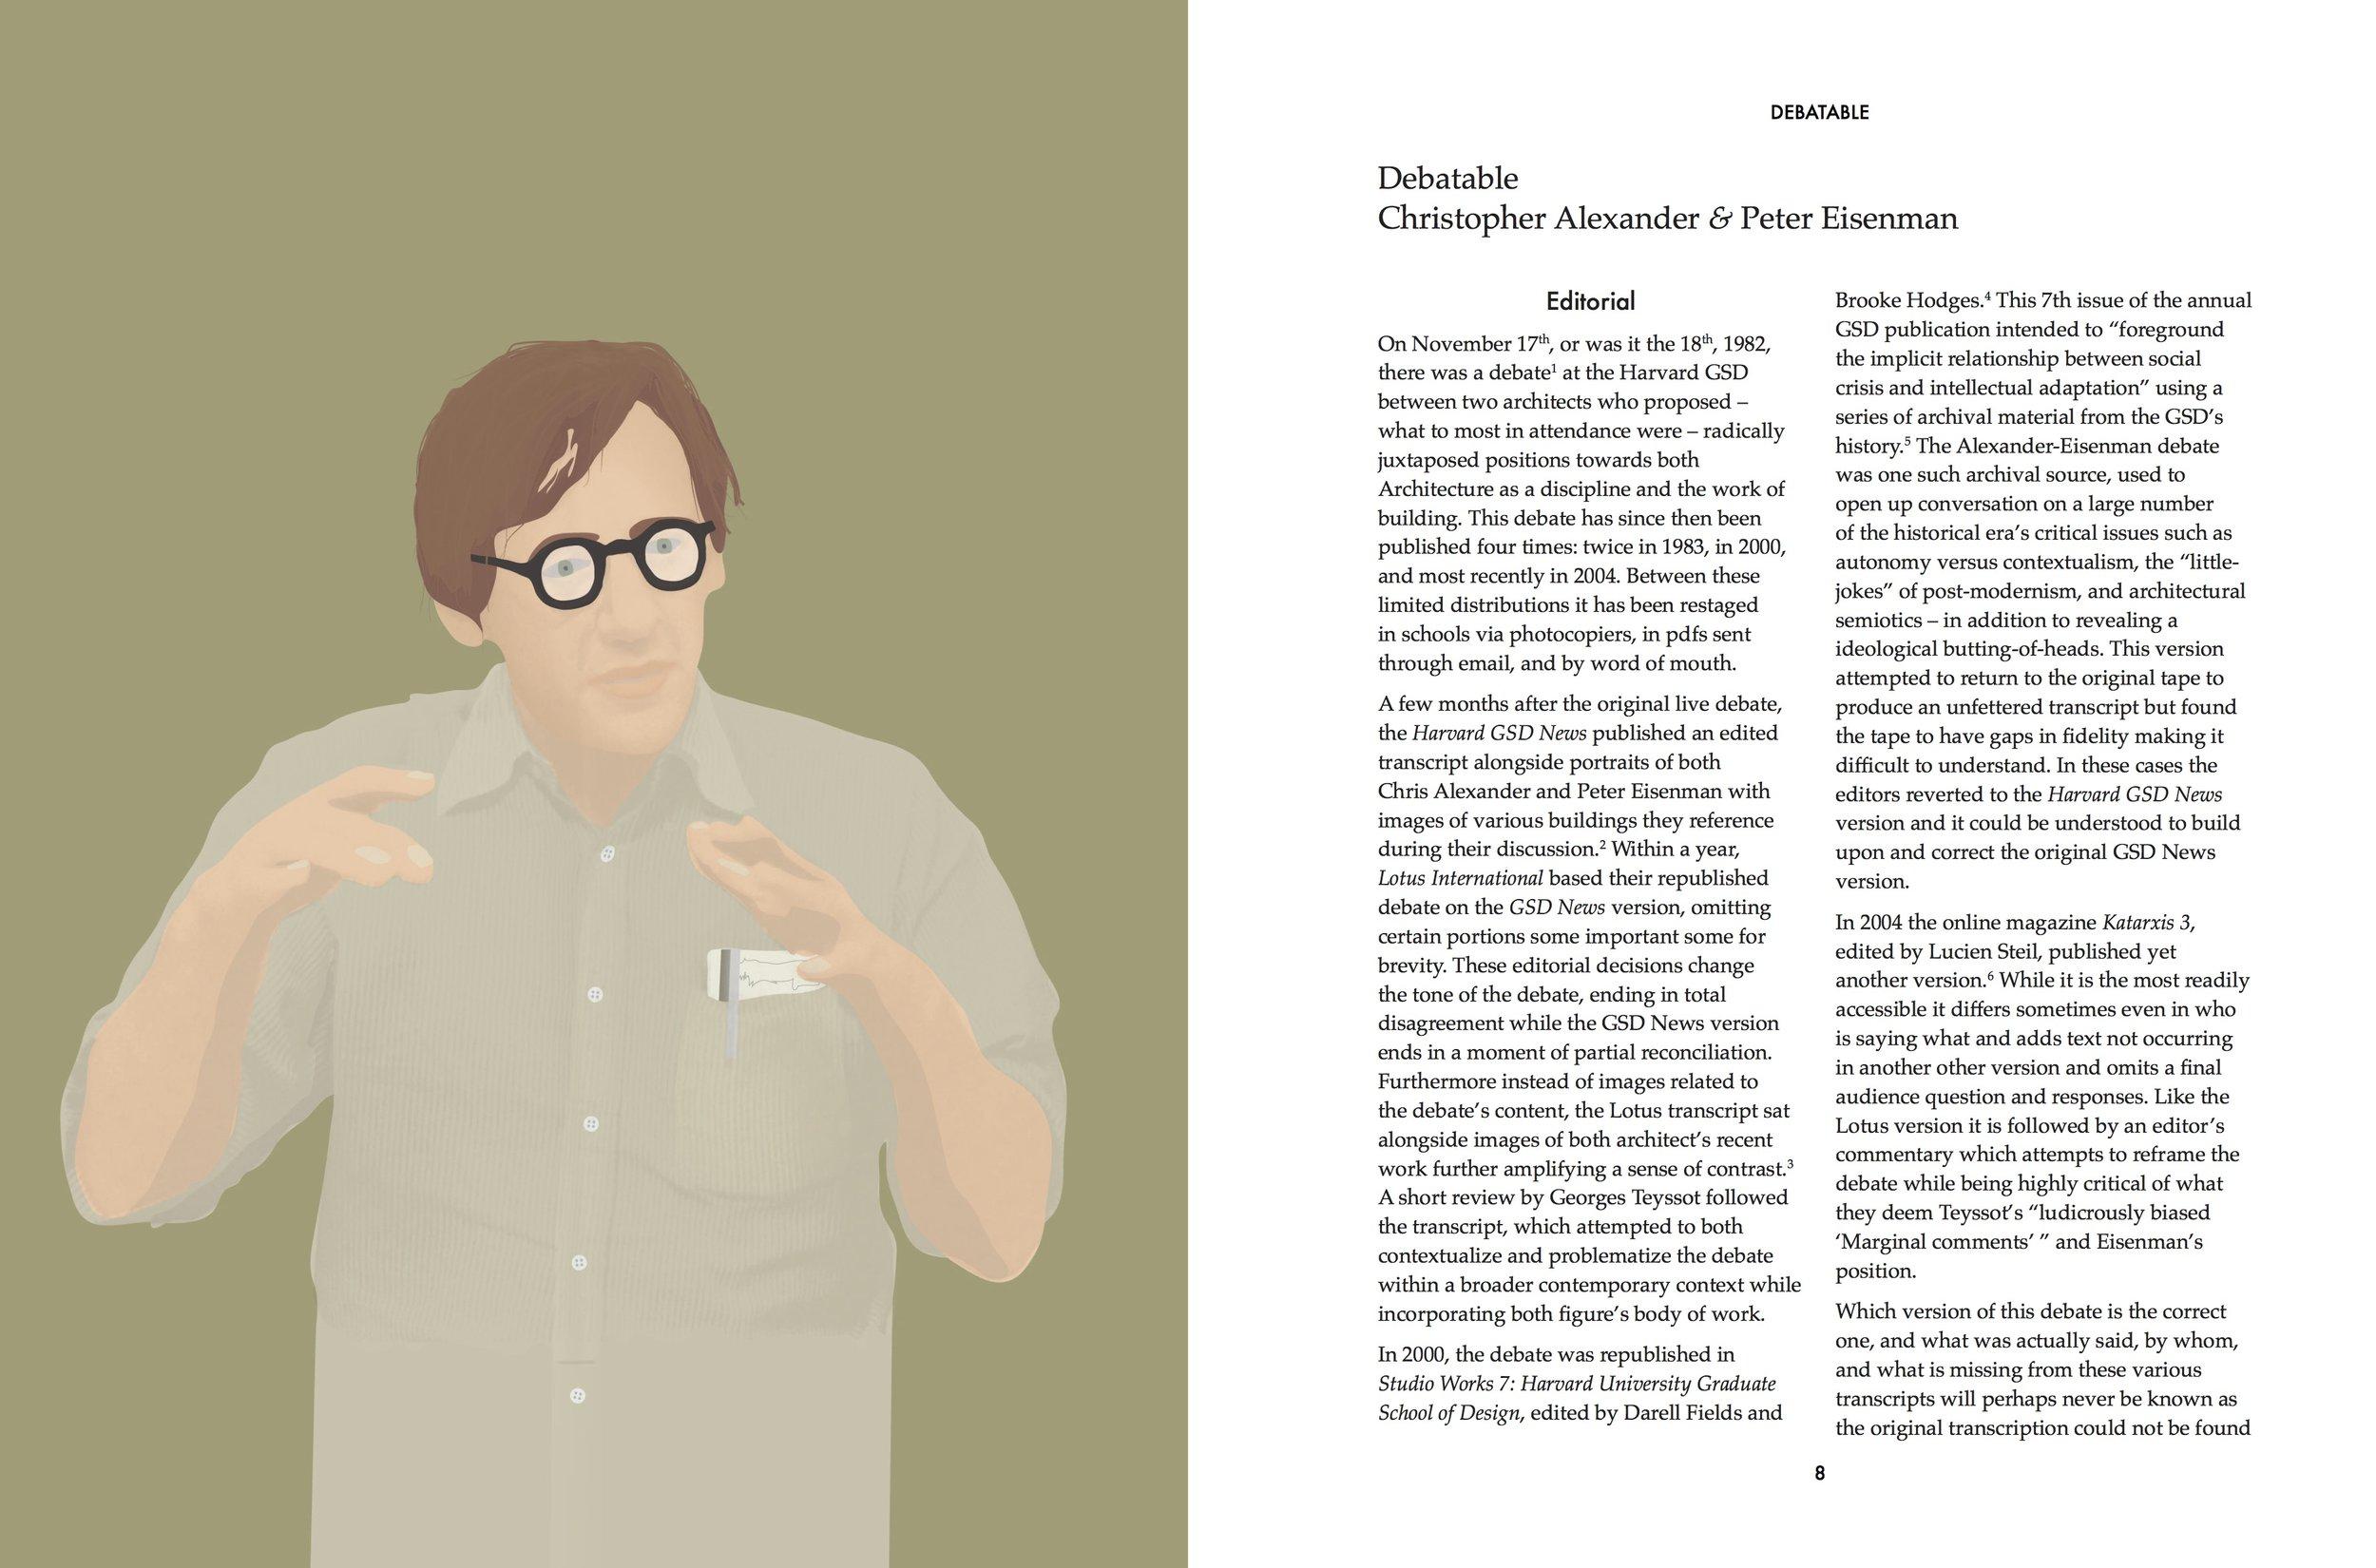 """Debatable —Christopher Alexander & Peter Eisenman"" The canonical debate republished again."